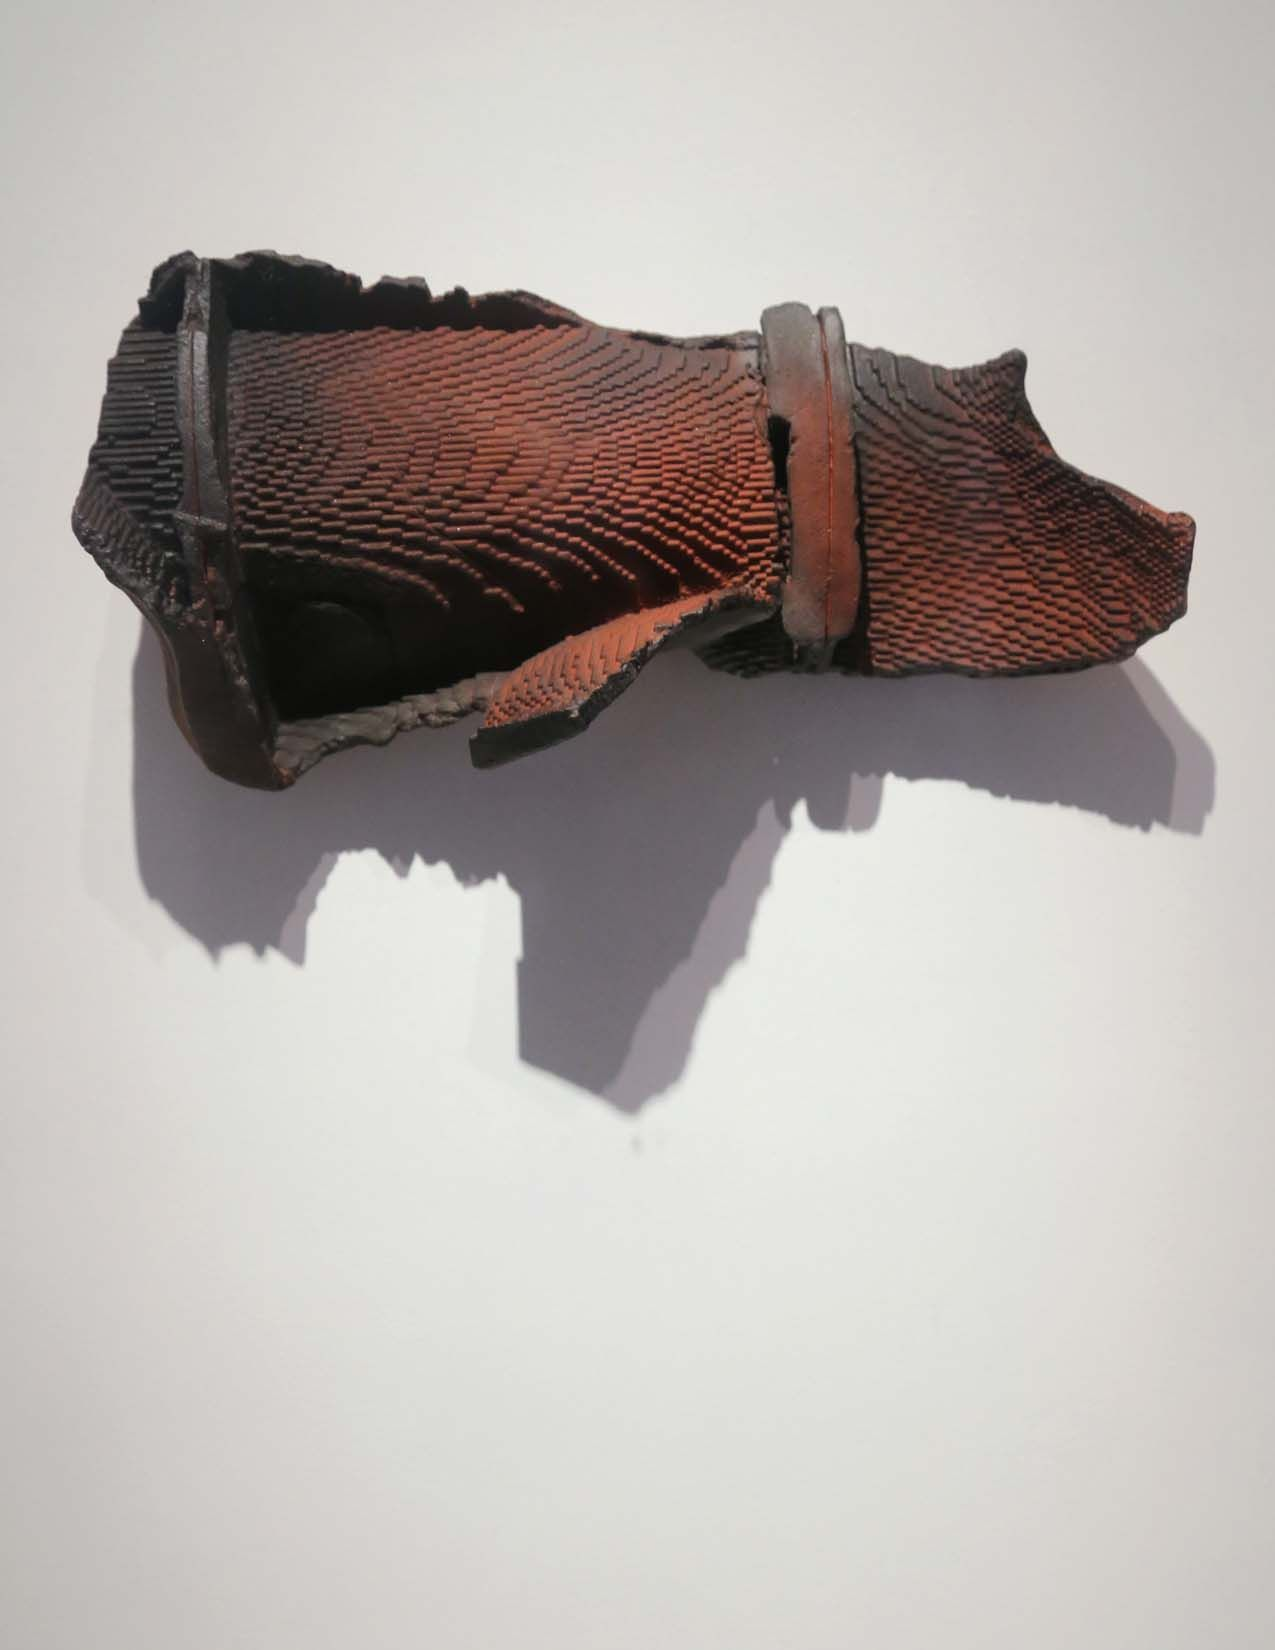 Alwar Balasubramaniam, Fragmented Conversation (detail), Plaster of paris, watercolor, soot & pigment, 2015